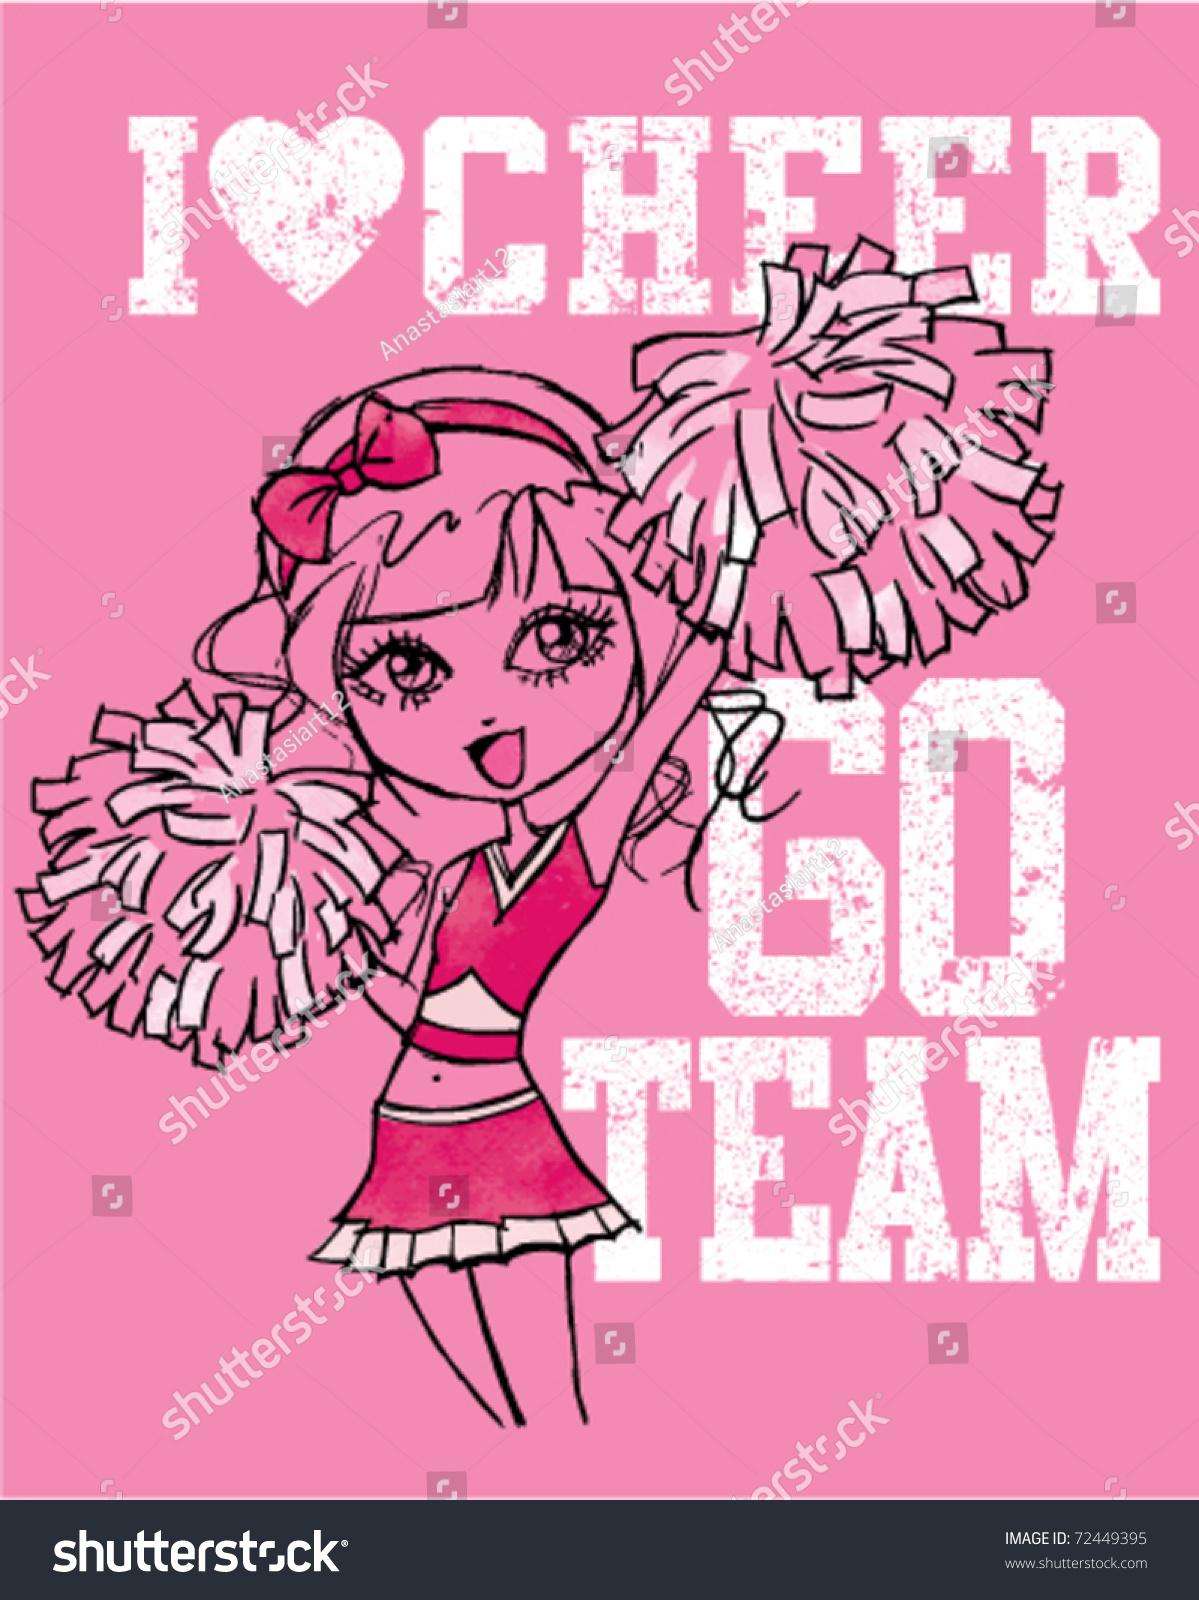 Handdrawn Cheerleader I Love Cheer Go Stock Vector